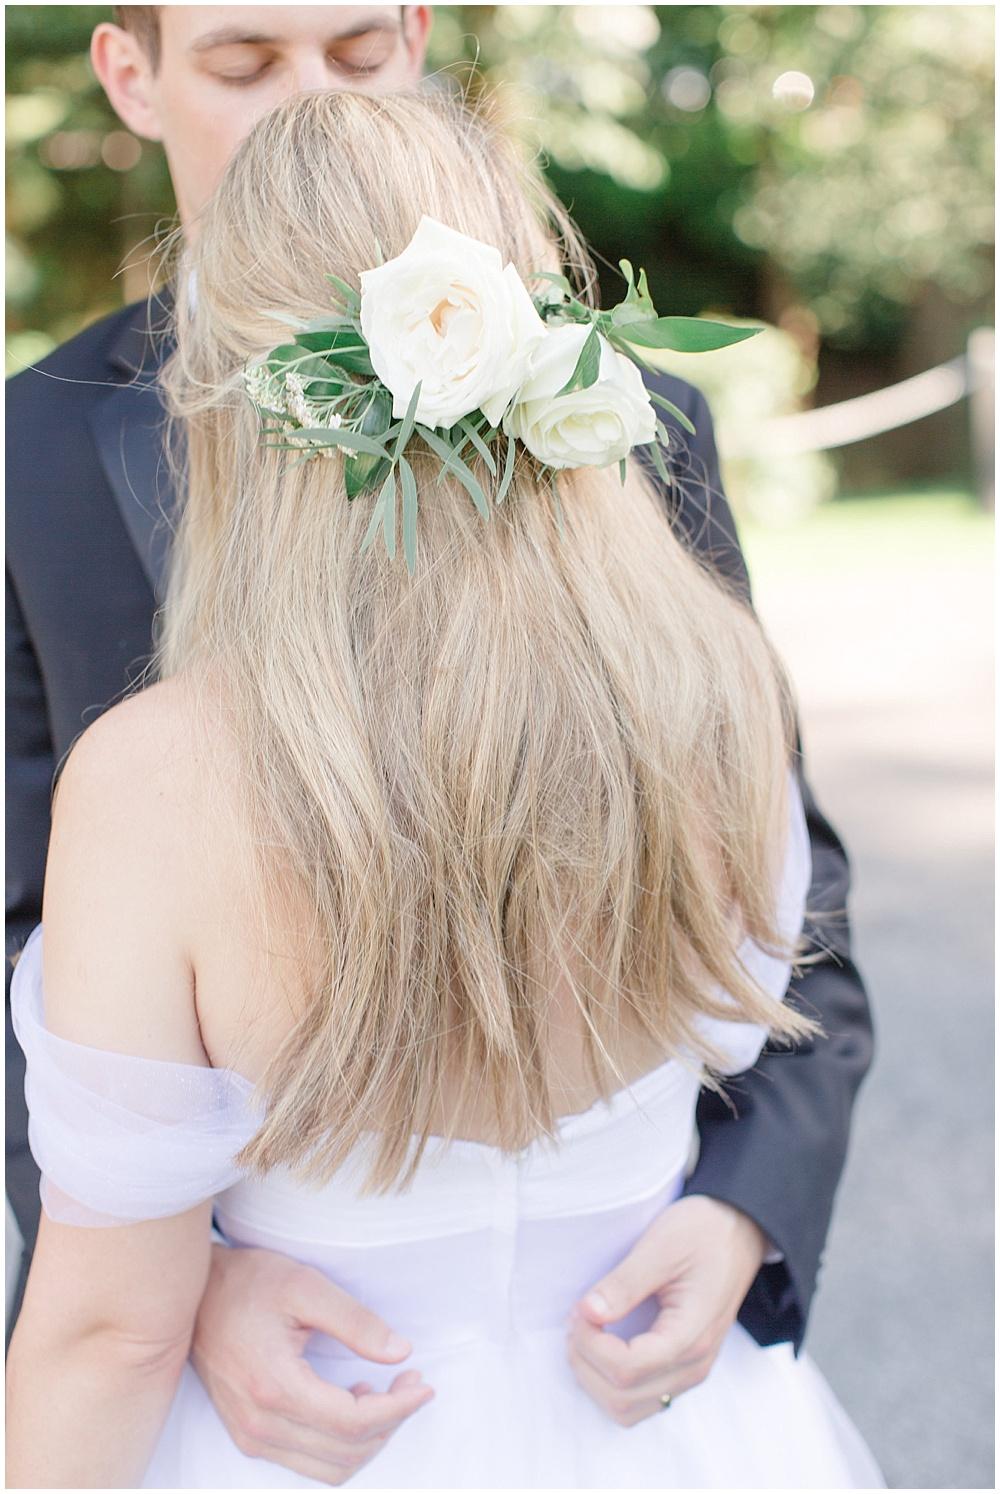 bridal hair floral  Sami Renee Photography + Jessica Dum Wedding Coordination